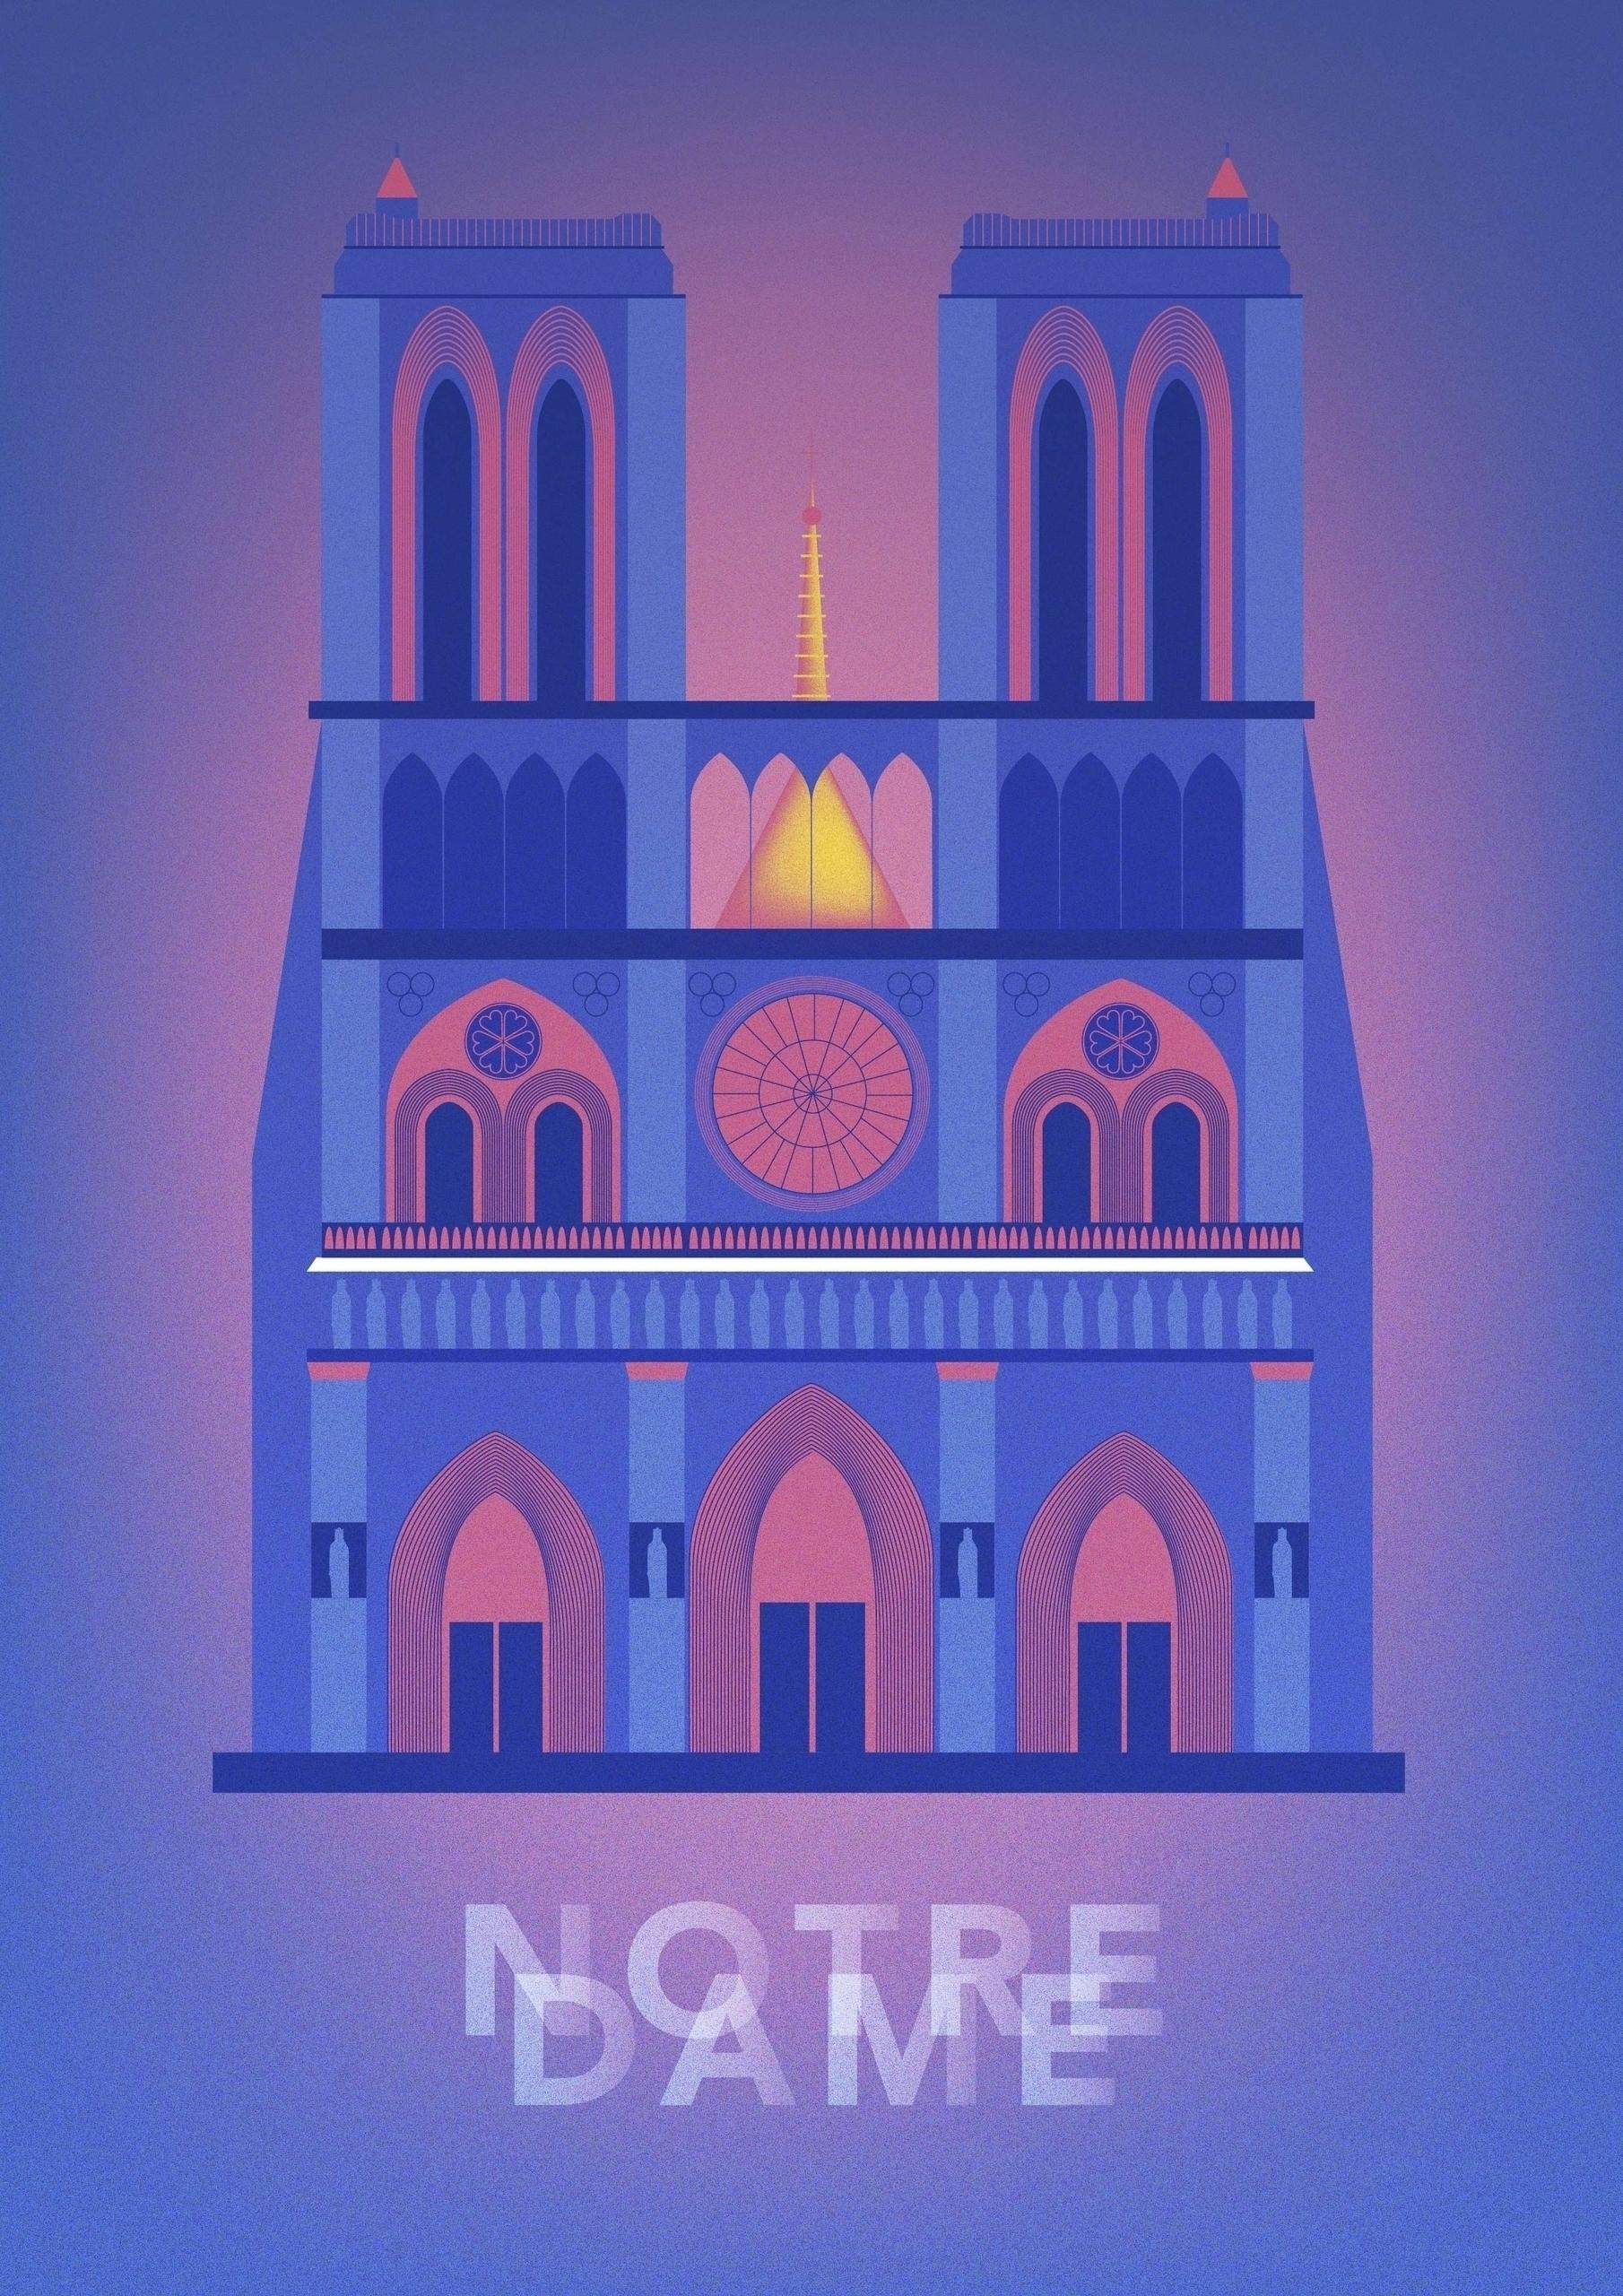 paris, notredame, illustration - ewelinagaska | ello